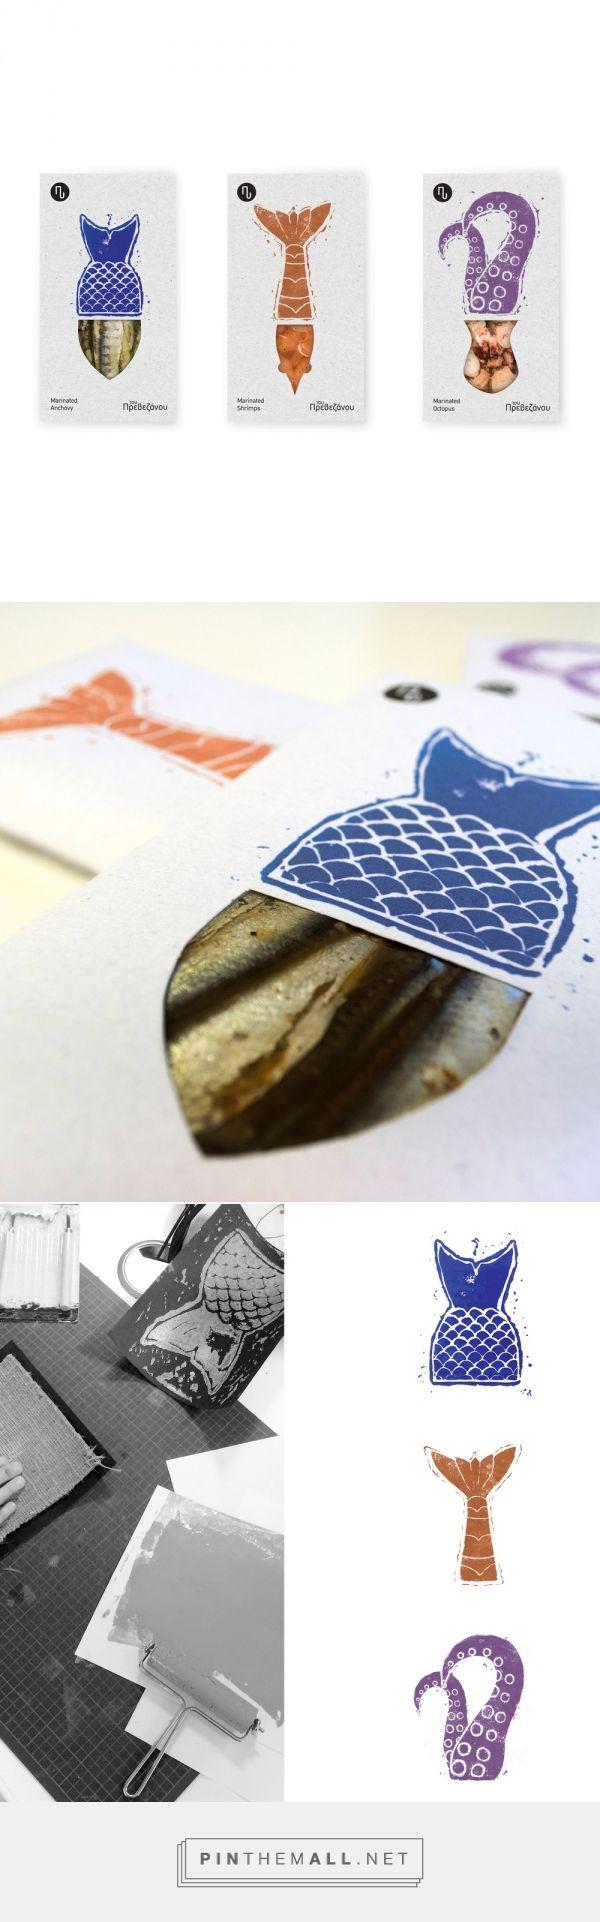 TOU PREVEZANOU — The Dieline - Branding & Packaging - created via https://pinthemall.net